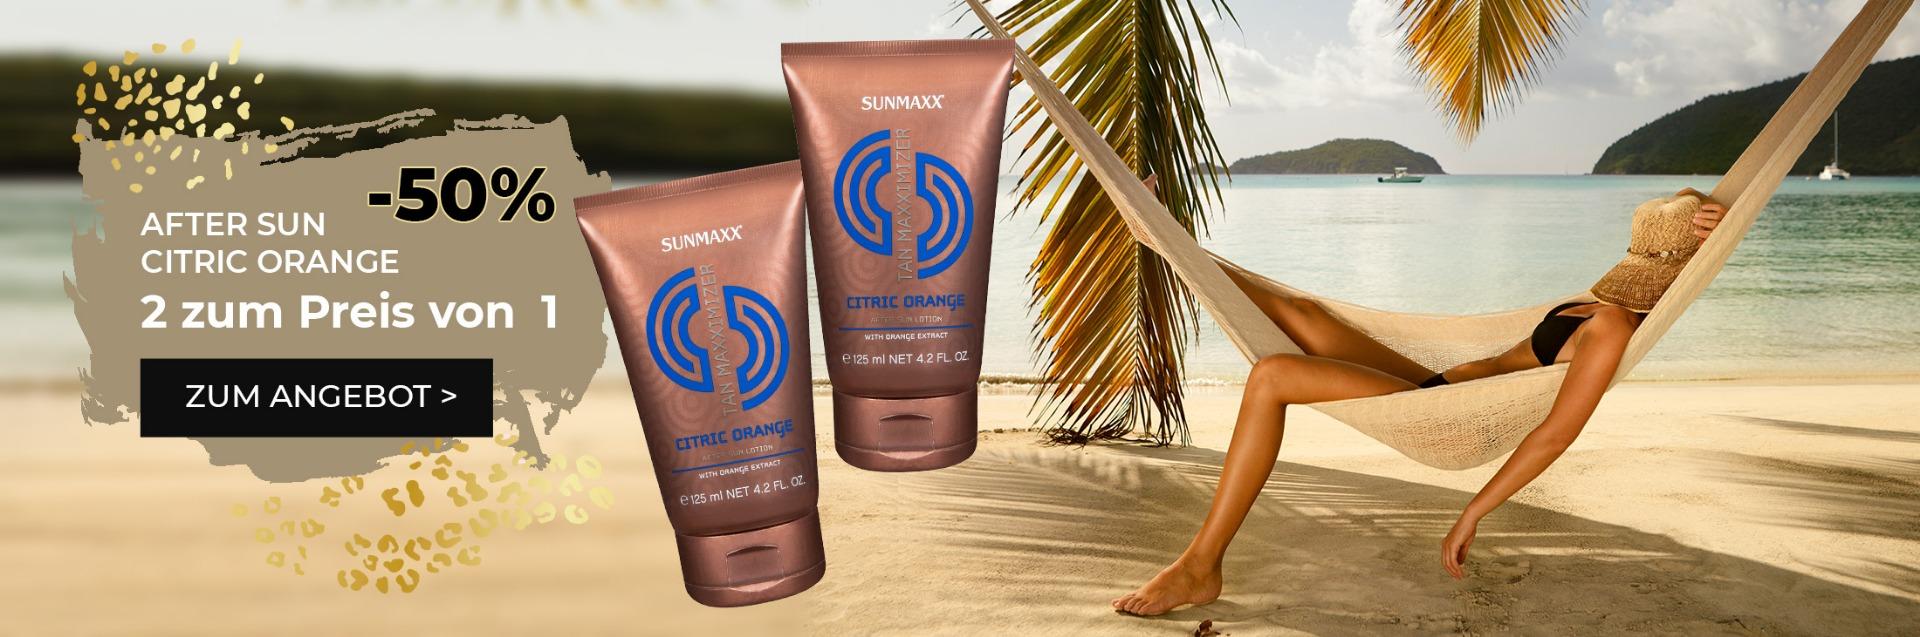 SUNMAXX Angebot